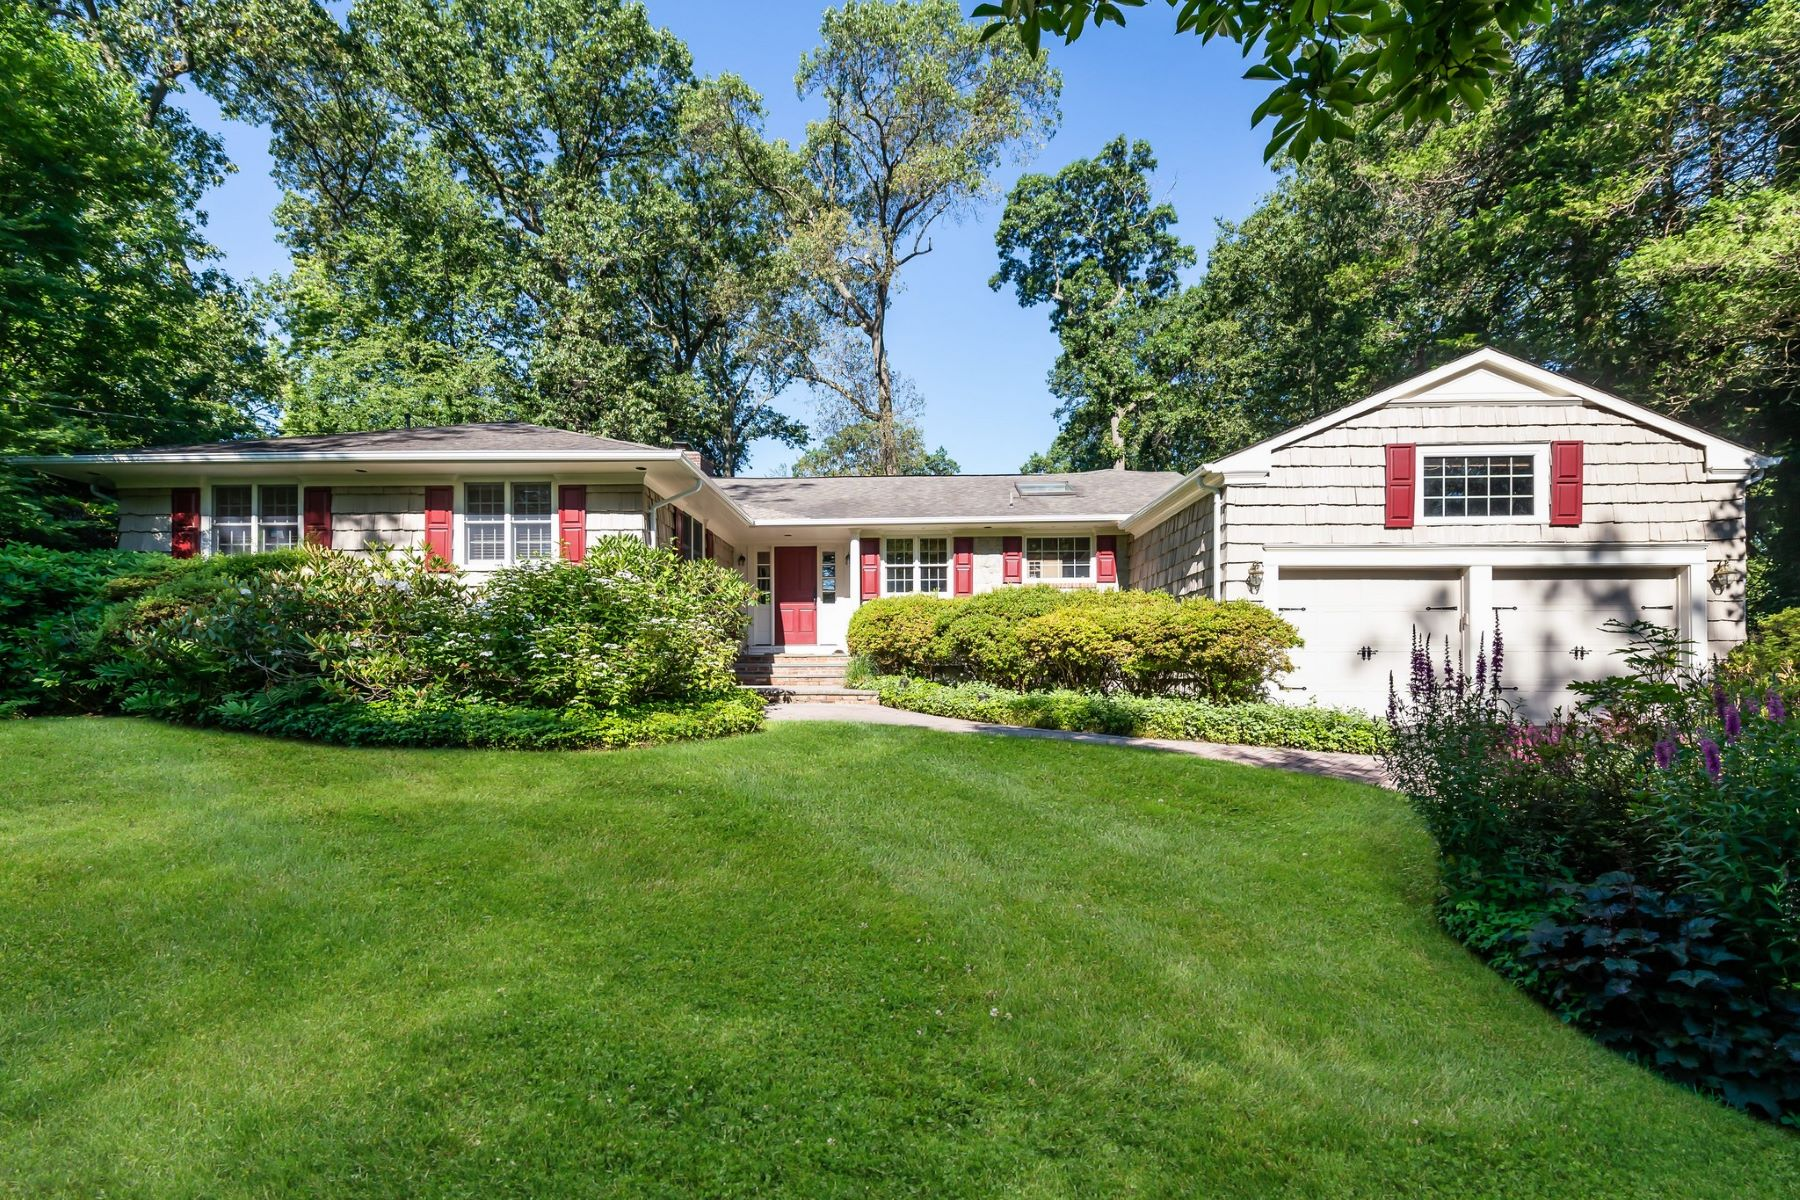 Single Family Homes for Active at Roslyn Estates 62 The Oaks Roslyn Estates, New York 11576 United States